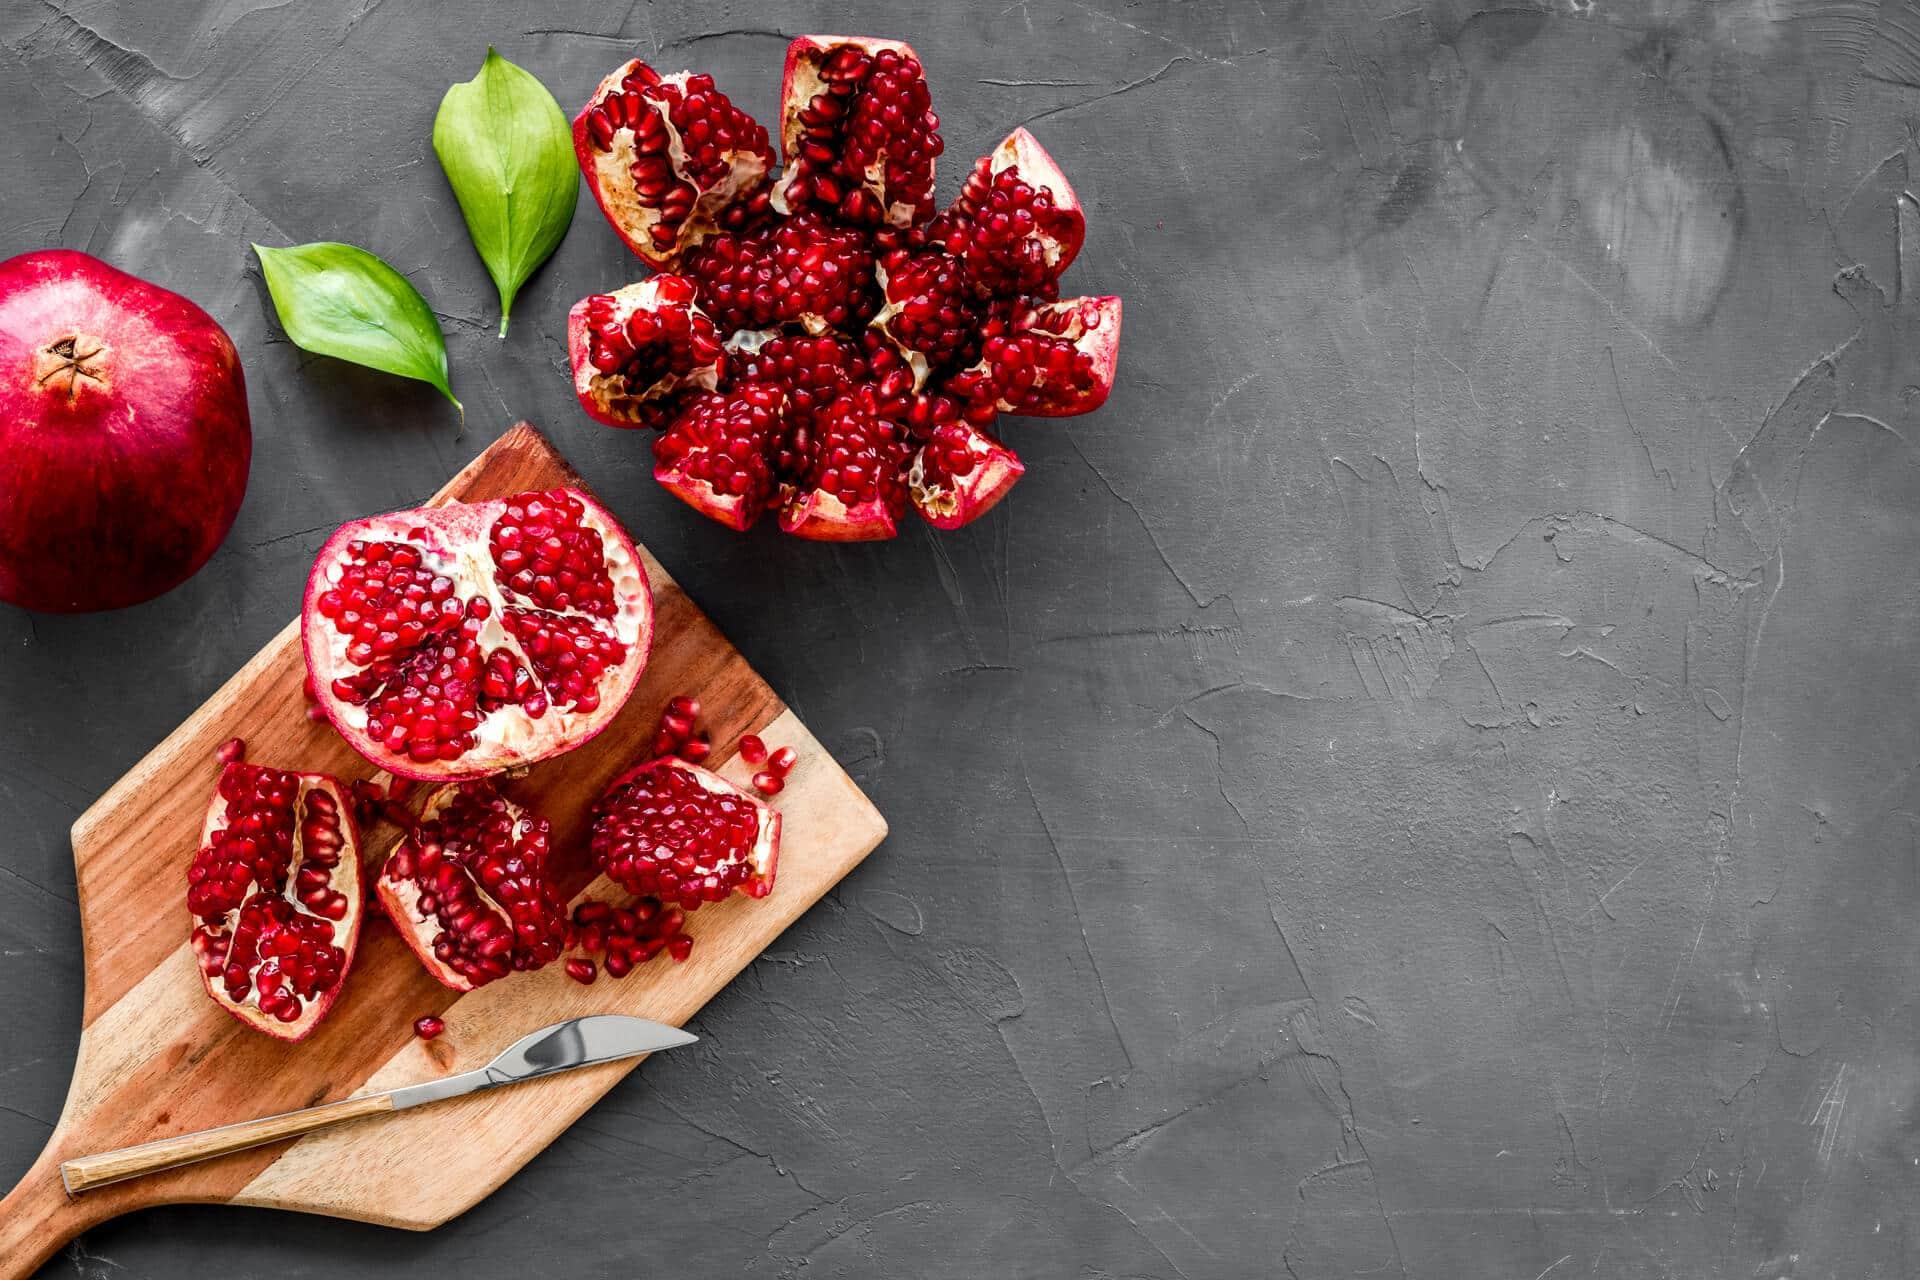 Peel pomegranate on cutting board